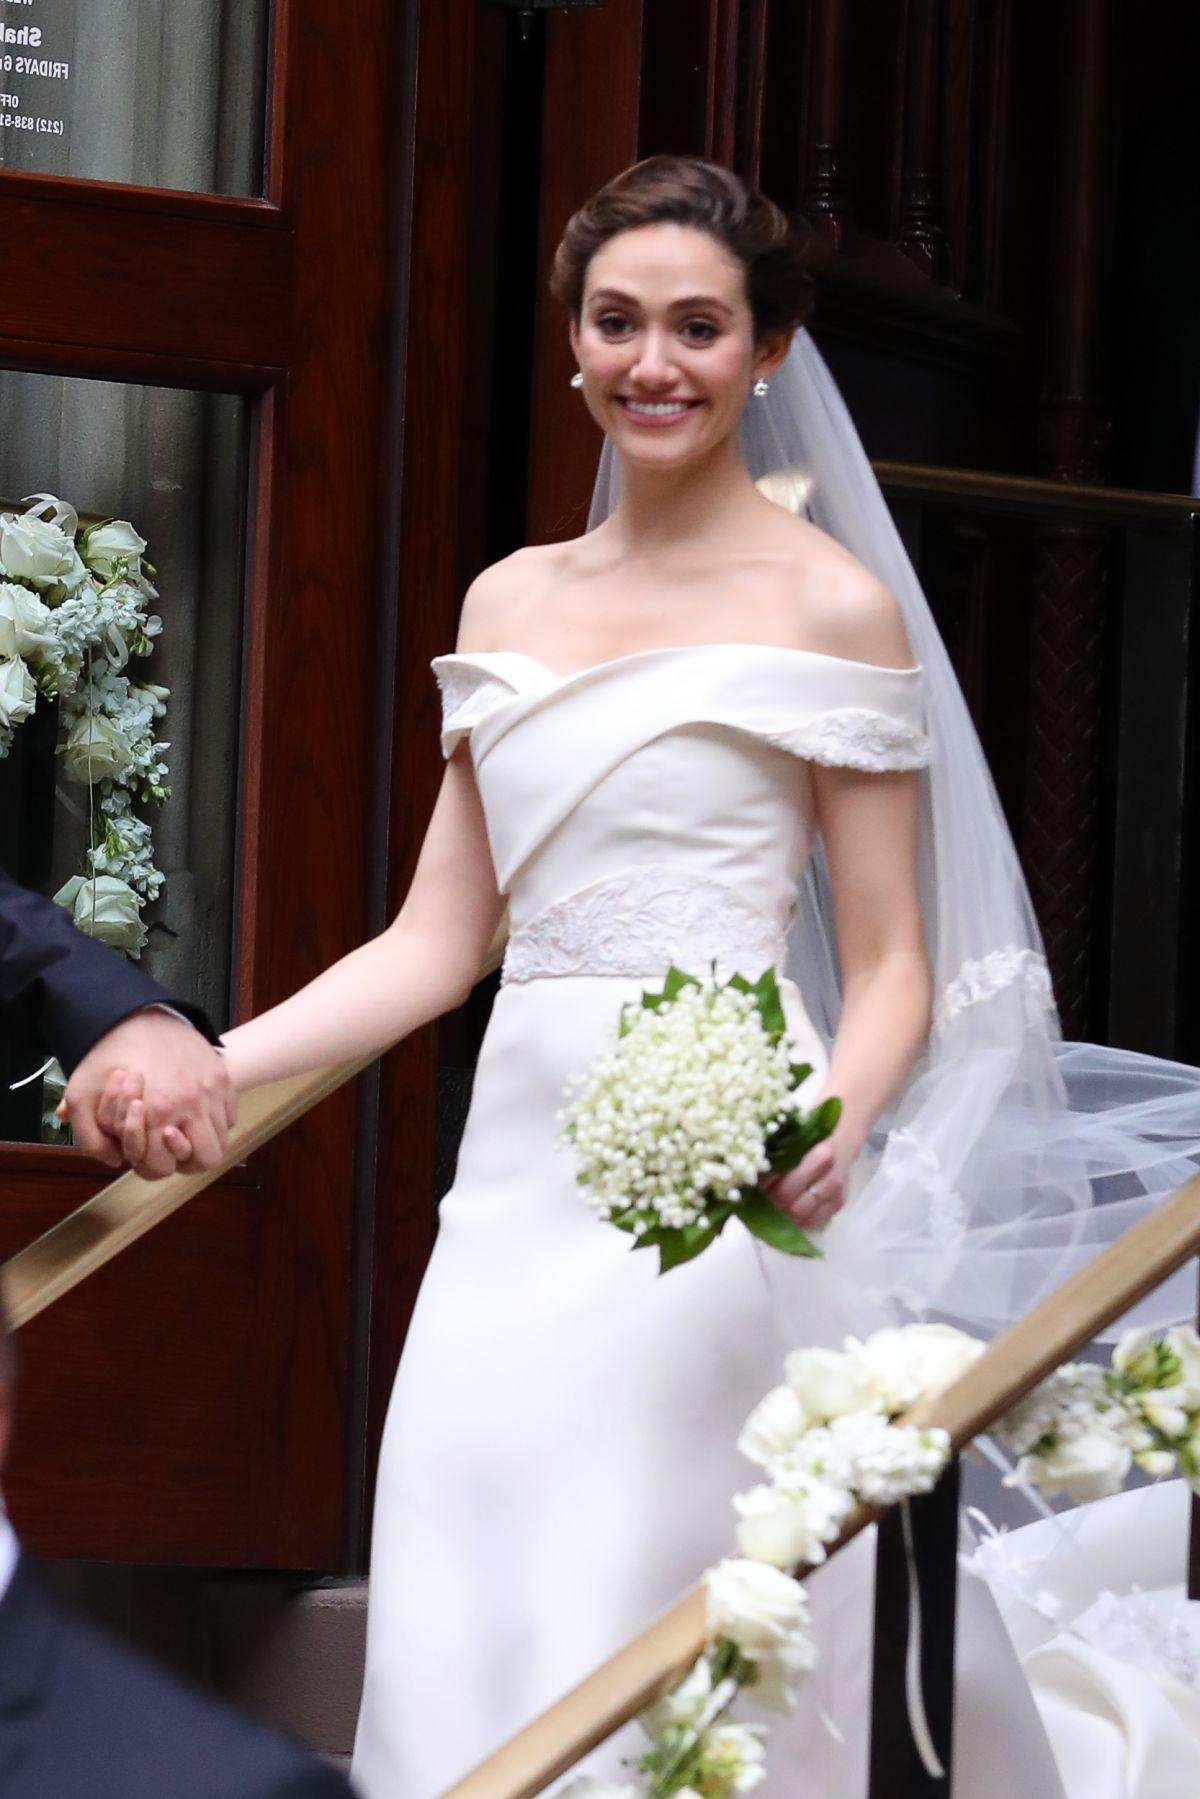 emmy-rossum-at-wedding-day-in-new-york-city_2.jpg